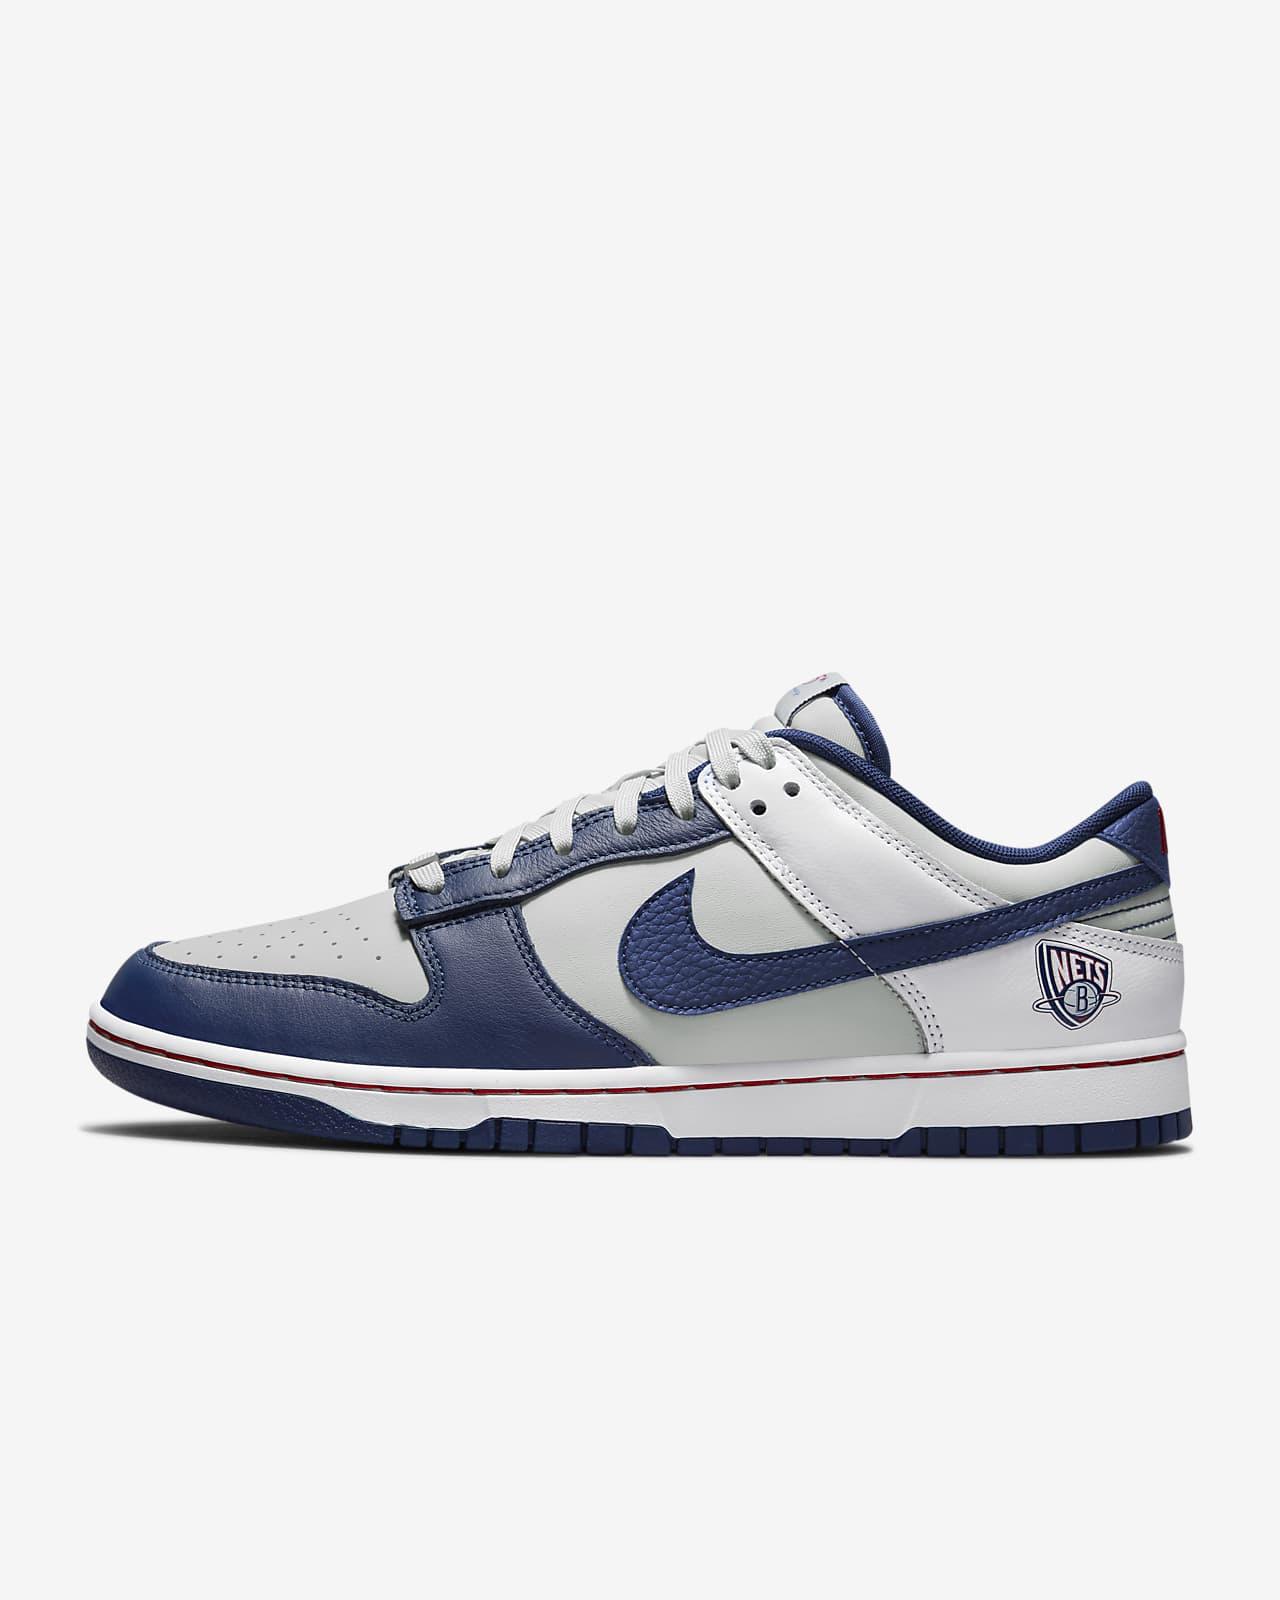 Nike Dunk Low Retro Men's Shoes